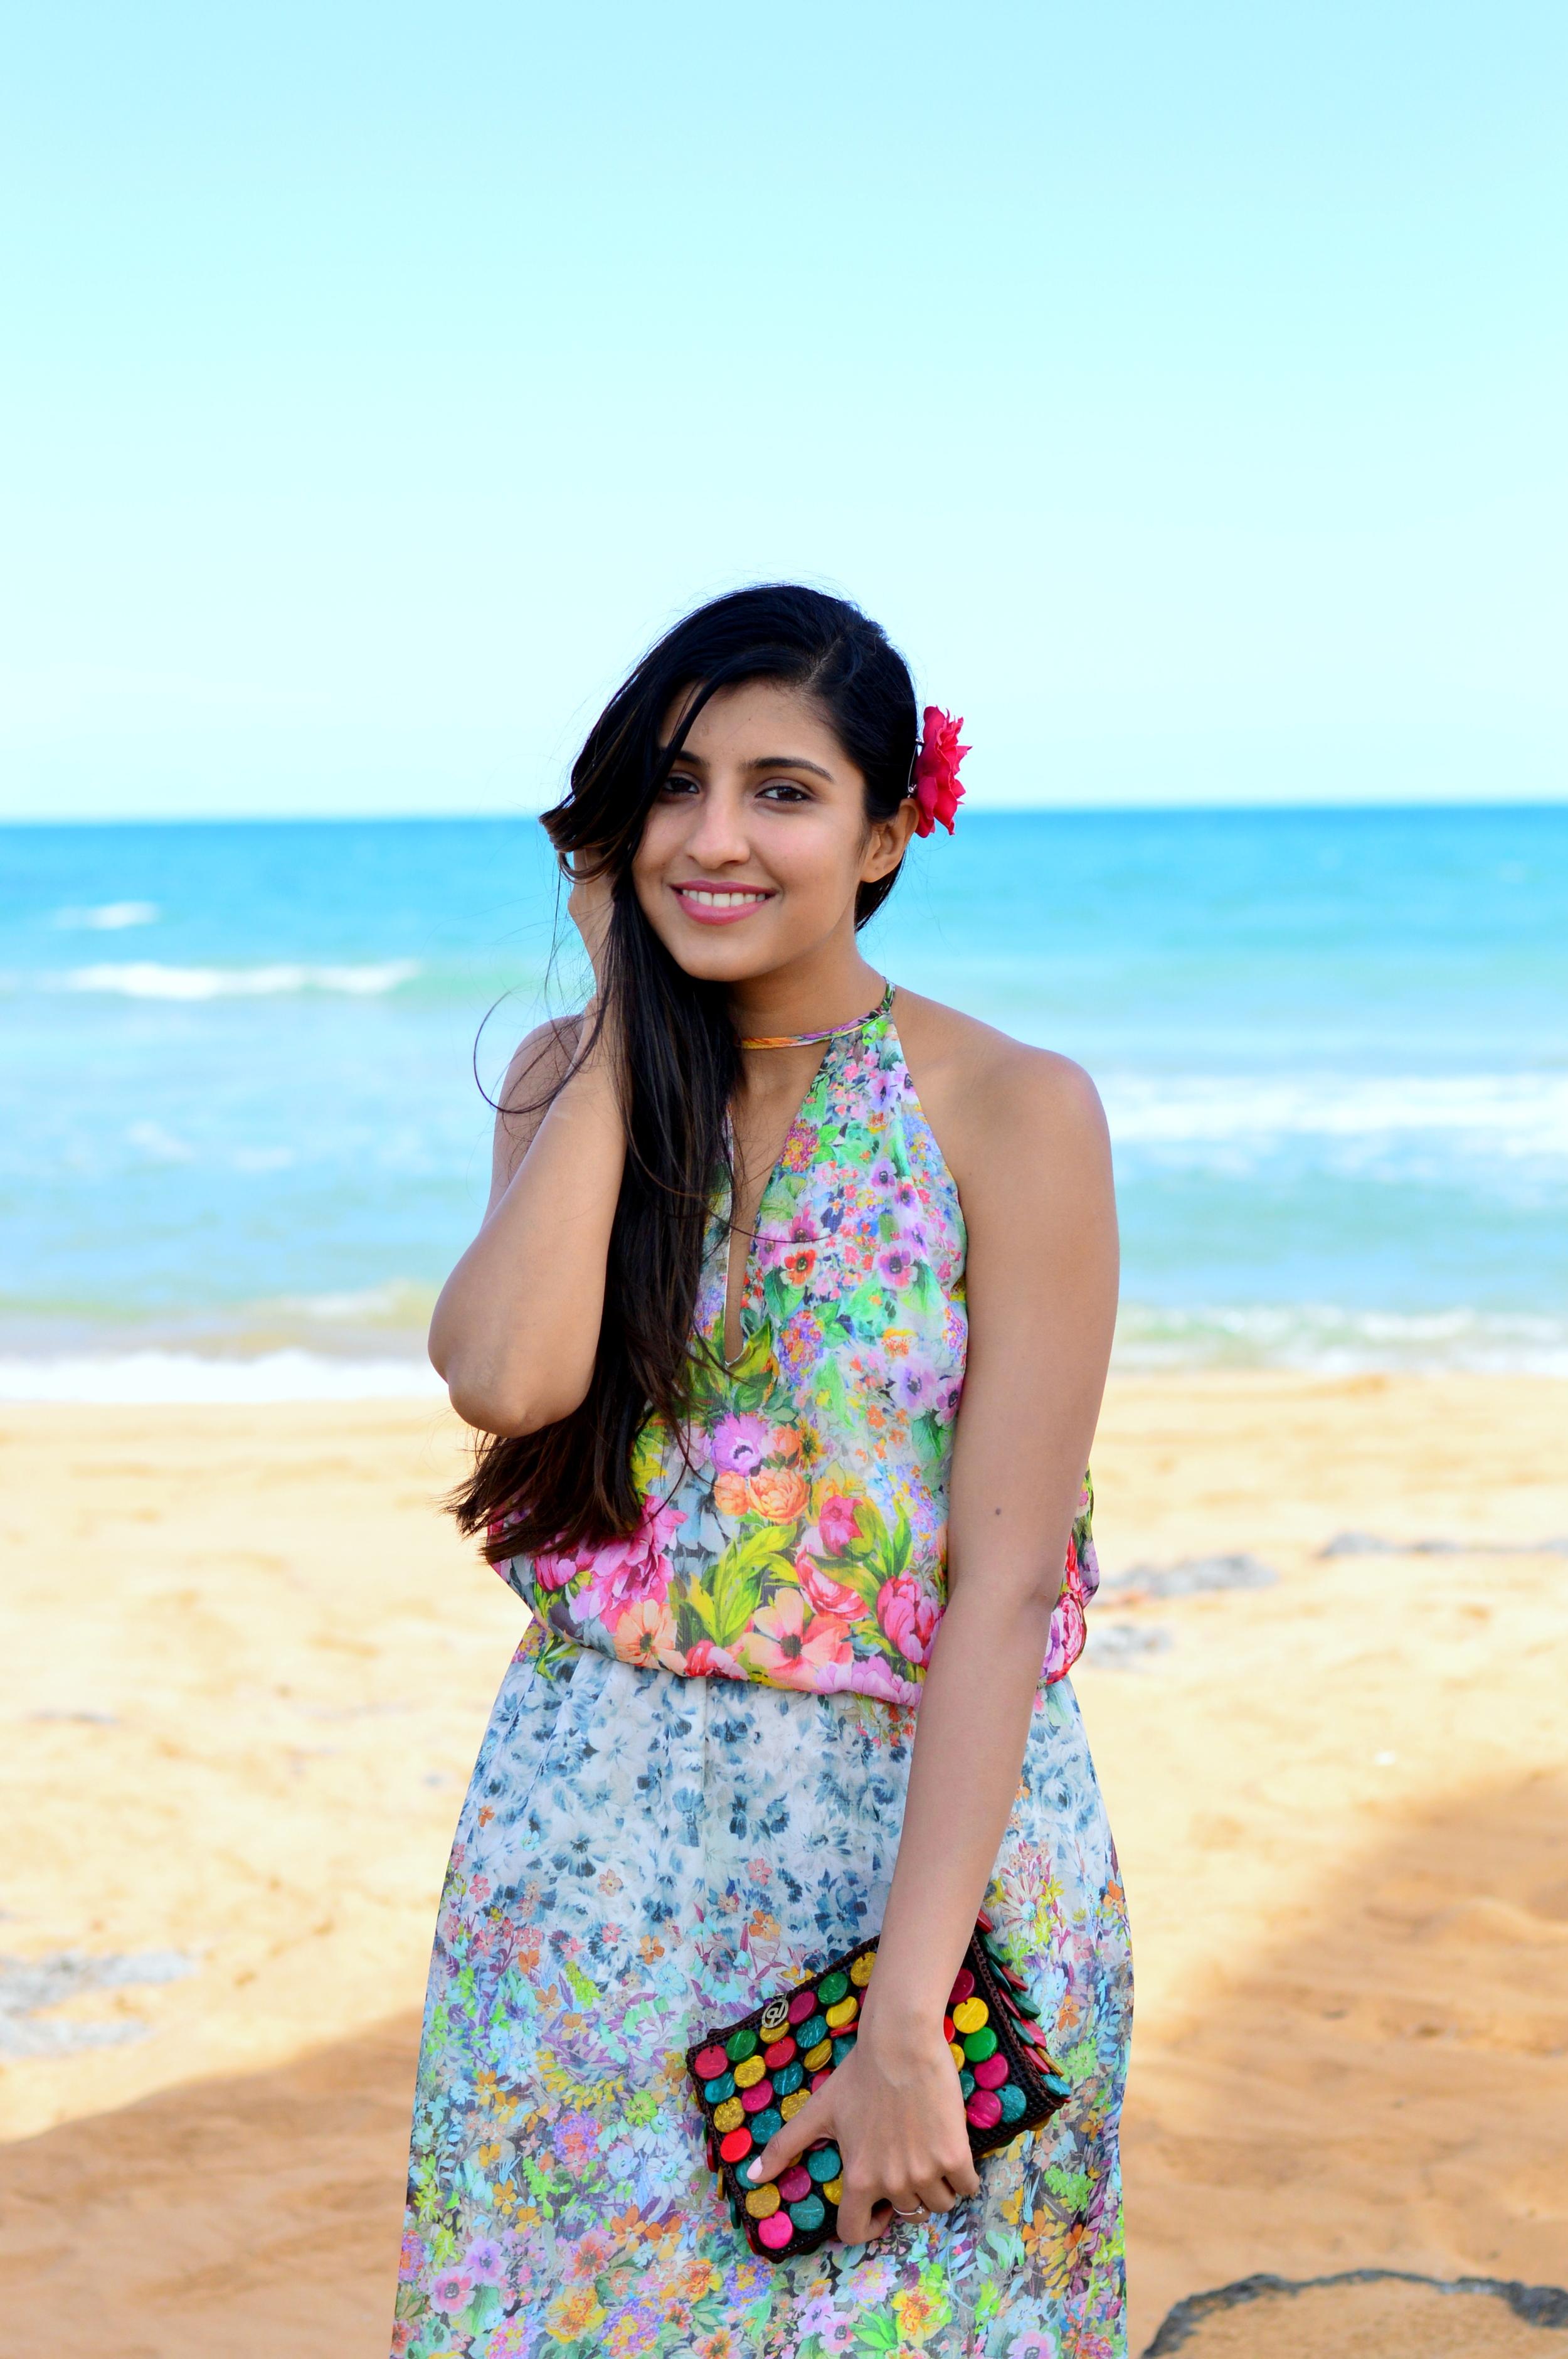 floral-maxi-dress-puerto-rico